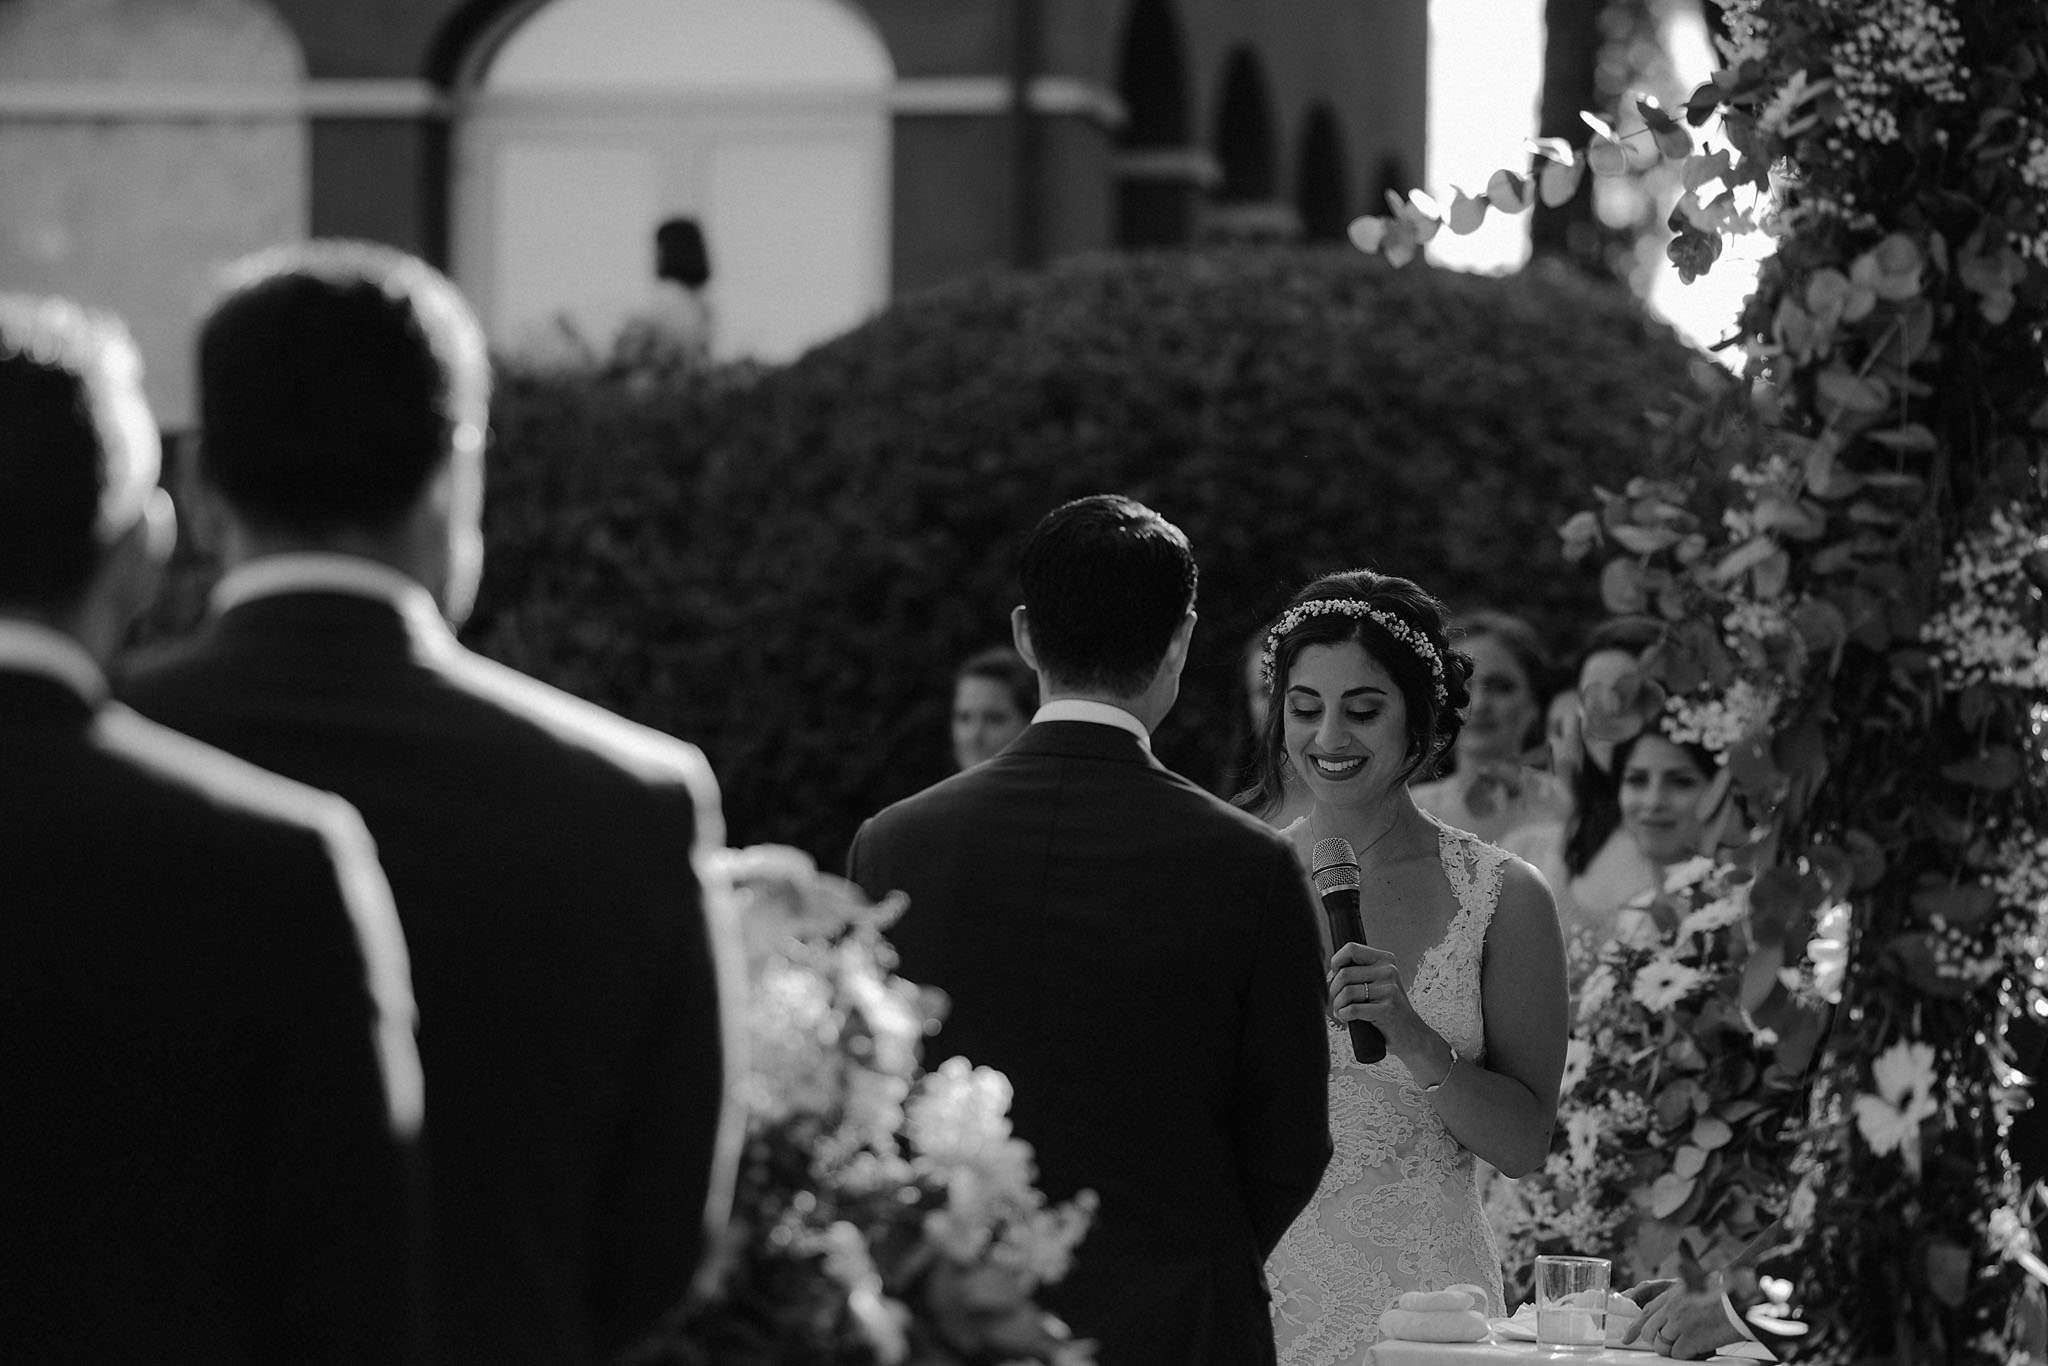 Max-Steph-Italy-Wedding-422.jpg